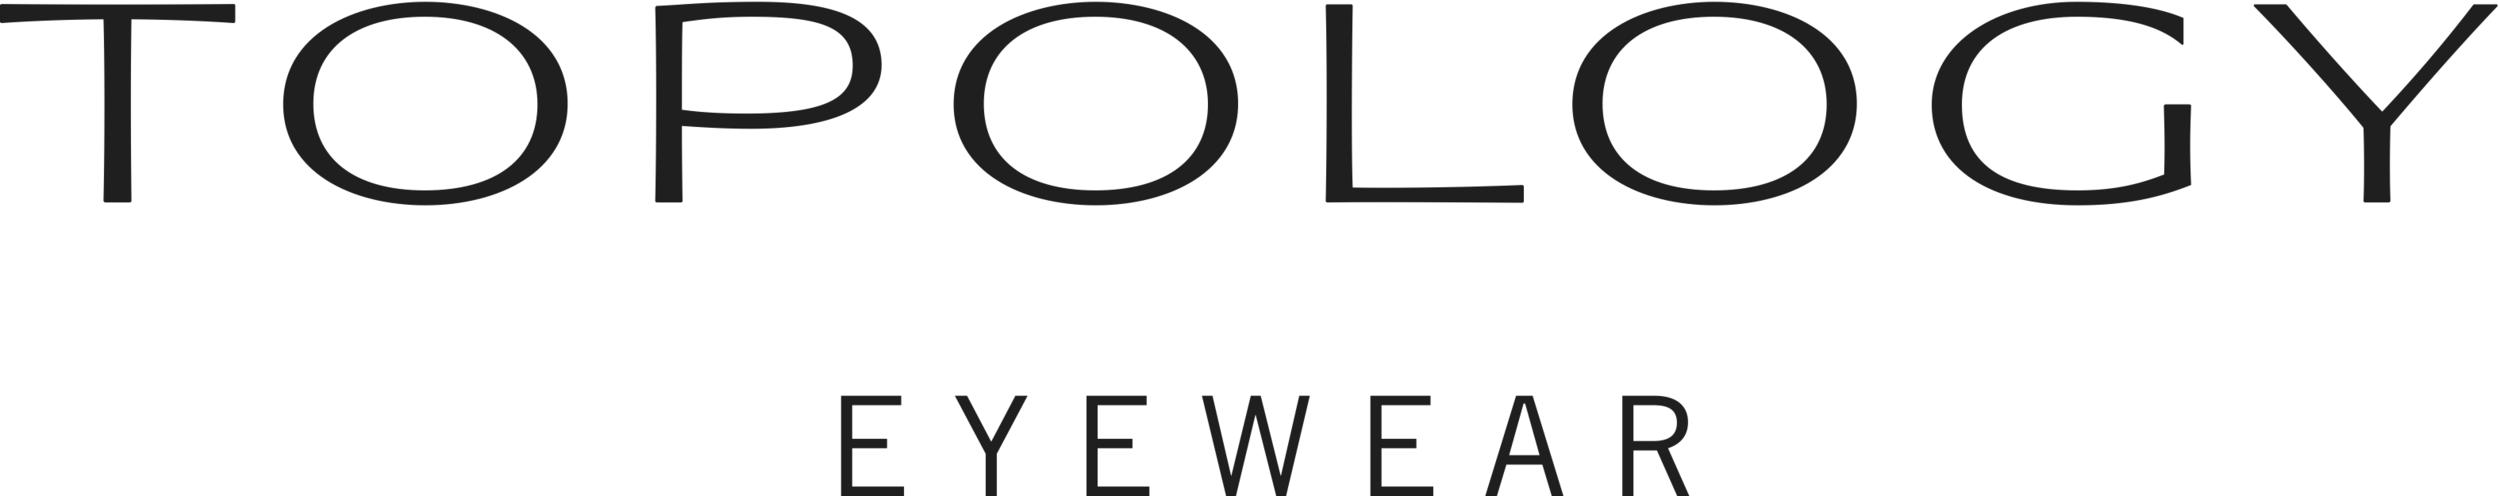 Topology_logo_Black_600.png